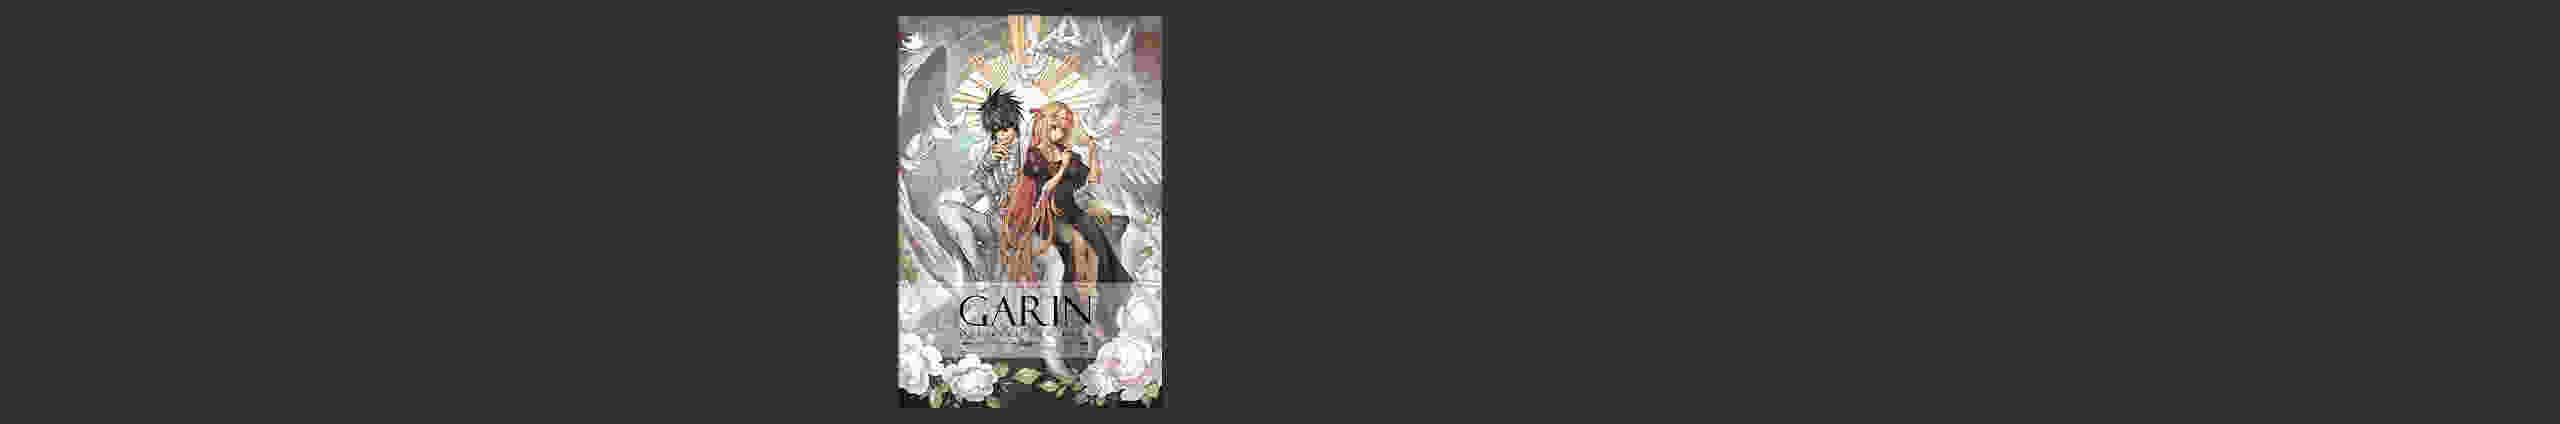 Garin Official Fanbook - Bright -